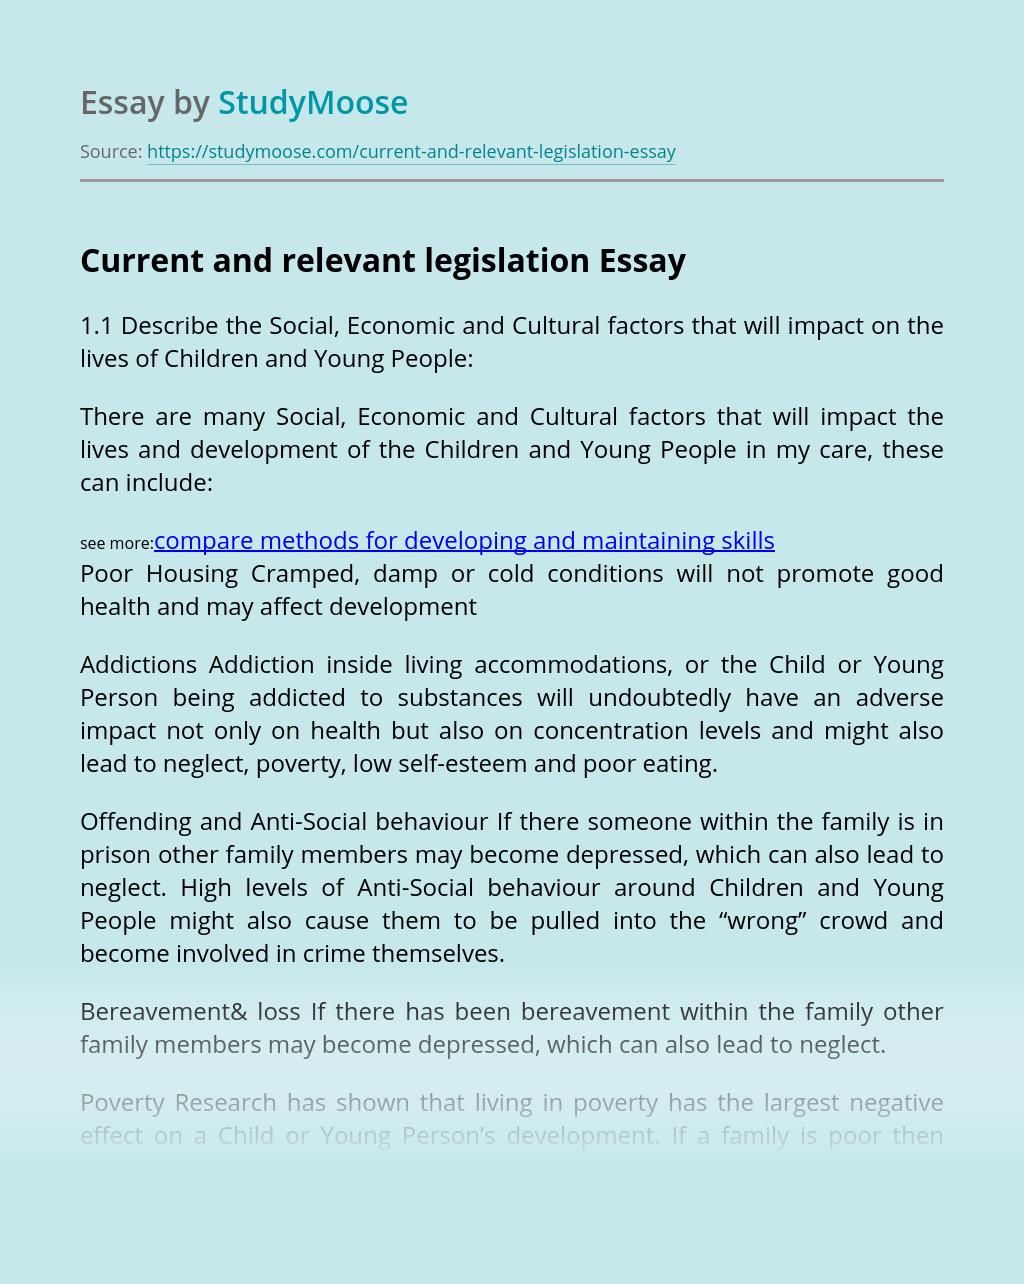 Current and relevant legislation